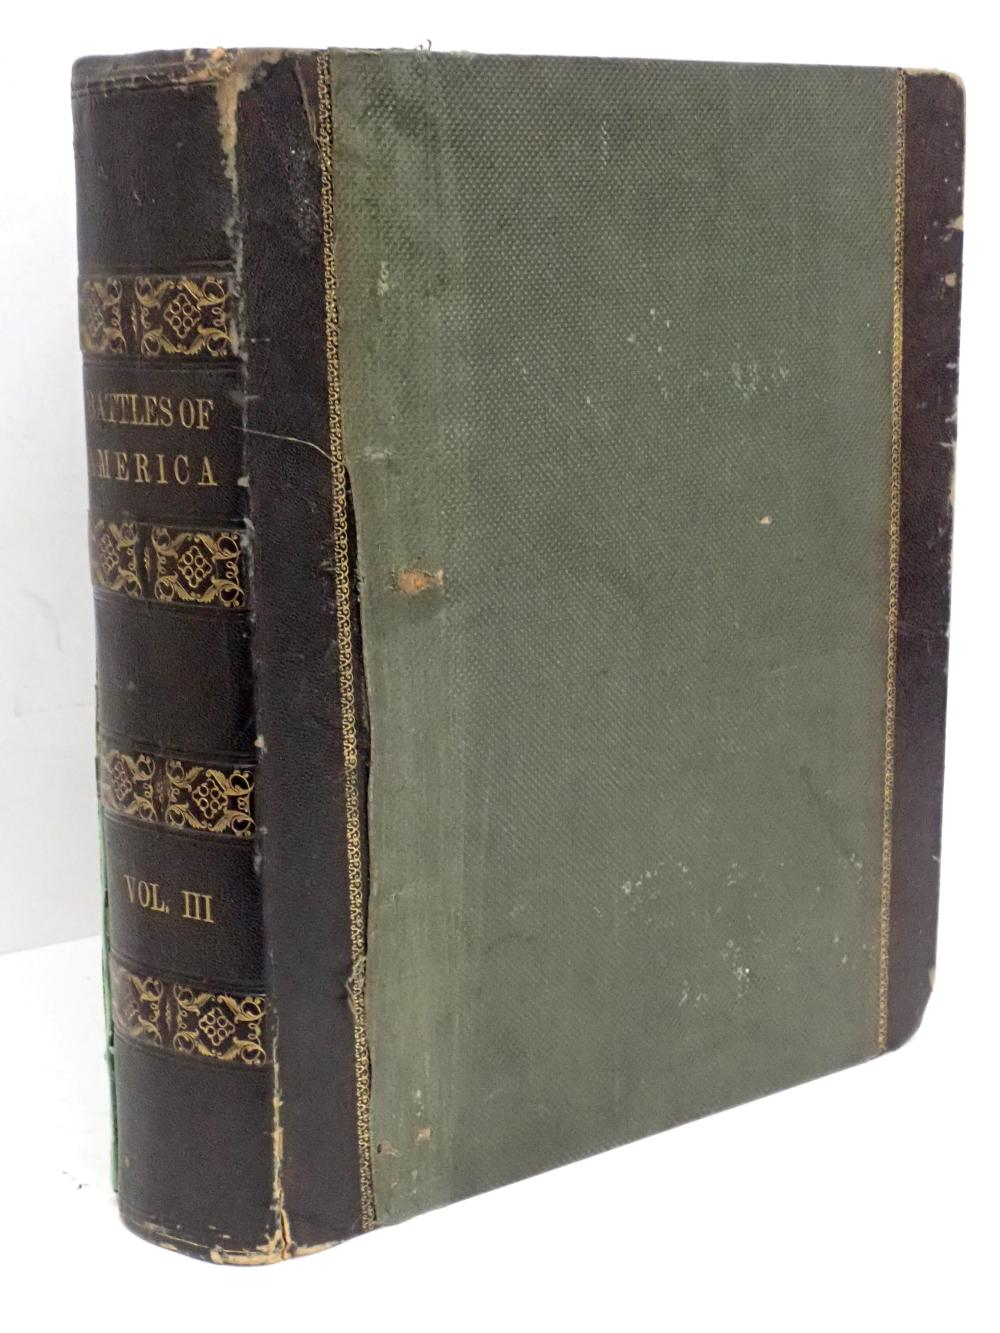 Huge 1861 Civil War Book: Battles of America by Sea and Land Vol III